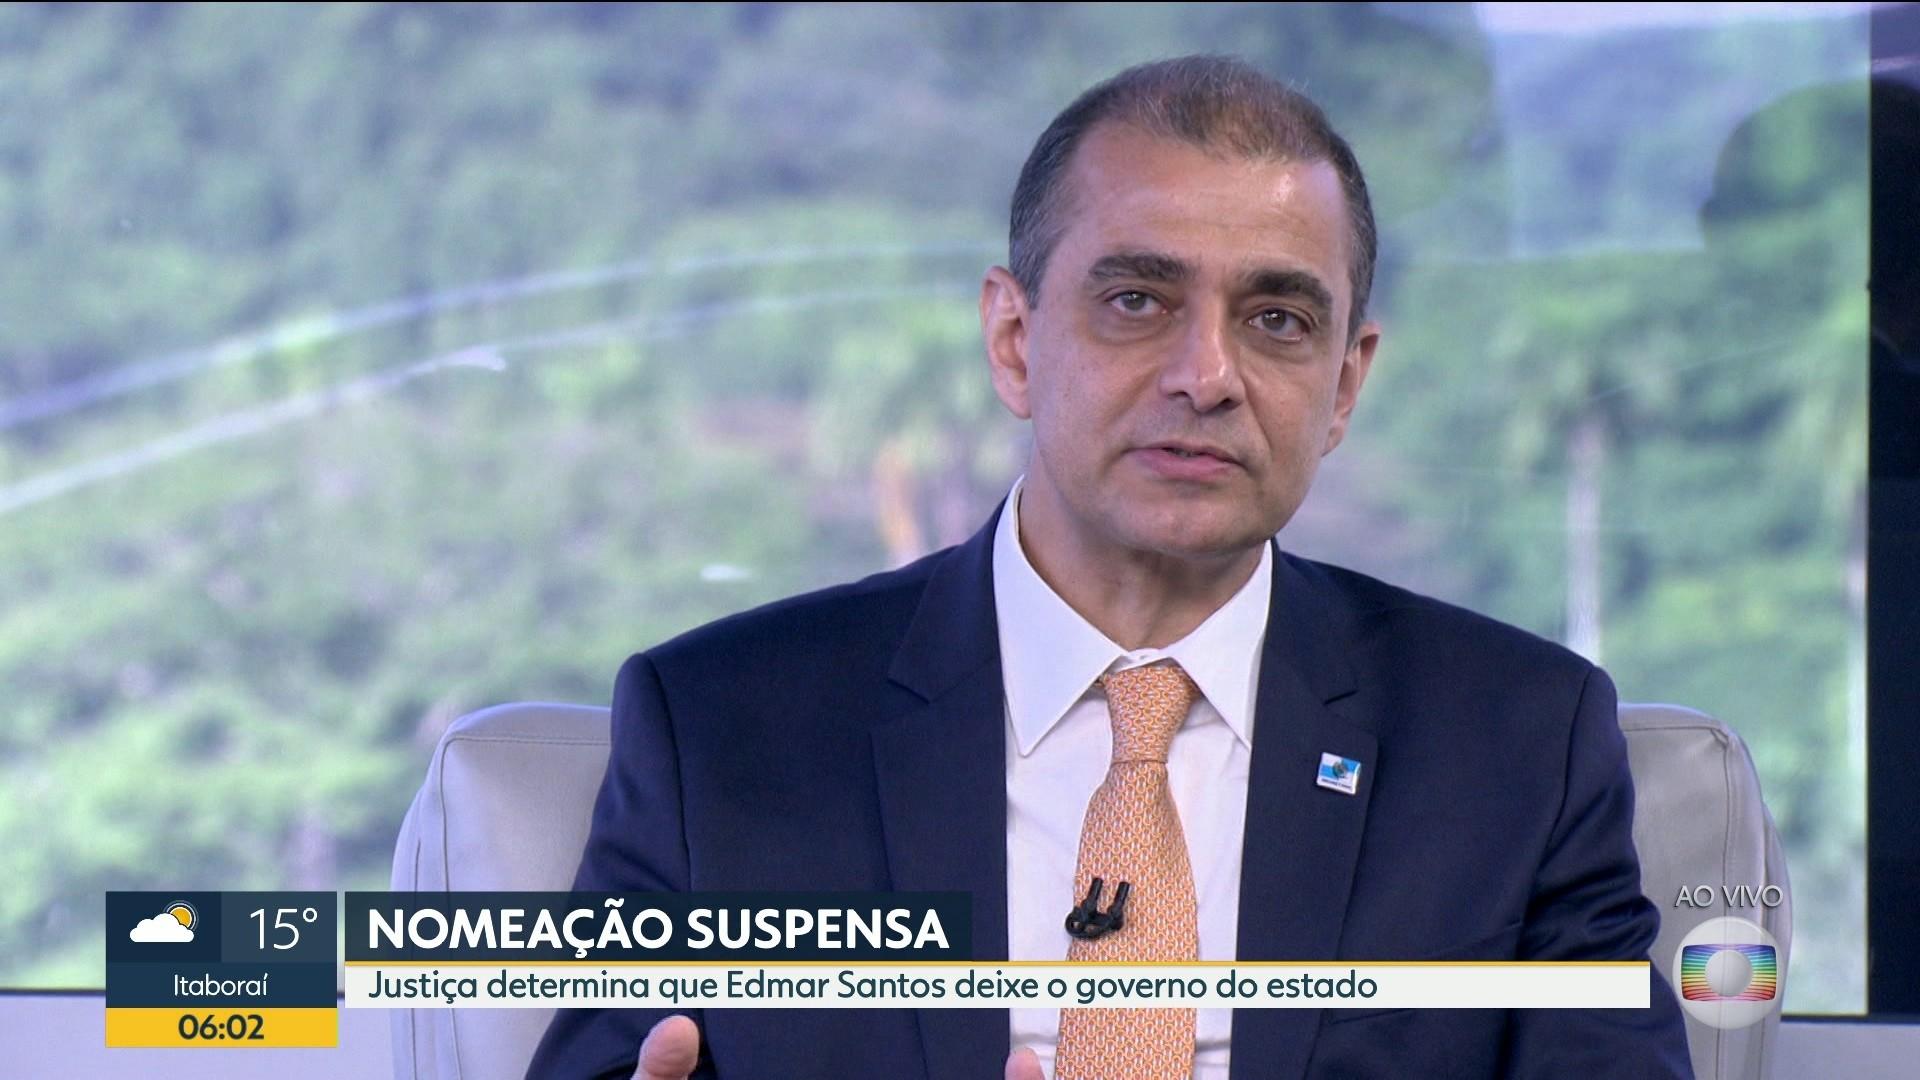 VÍDEOS: Bom Dia Rio de quinta-feira, 28 de maio